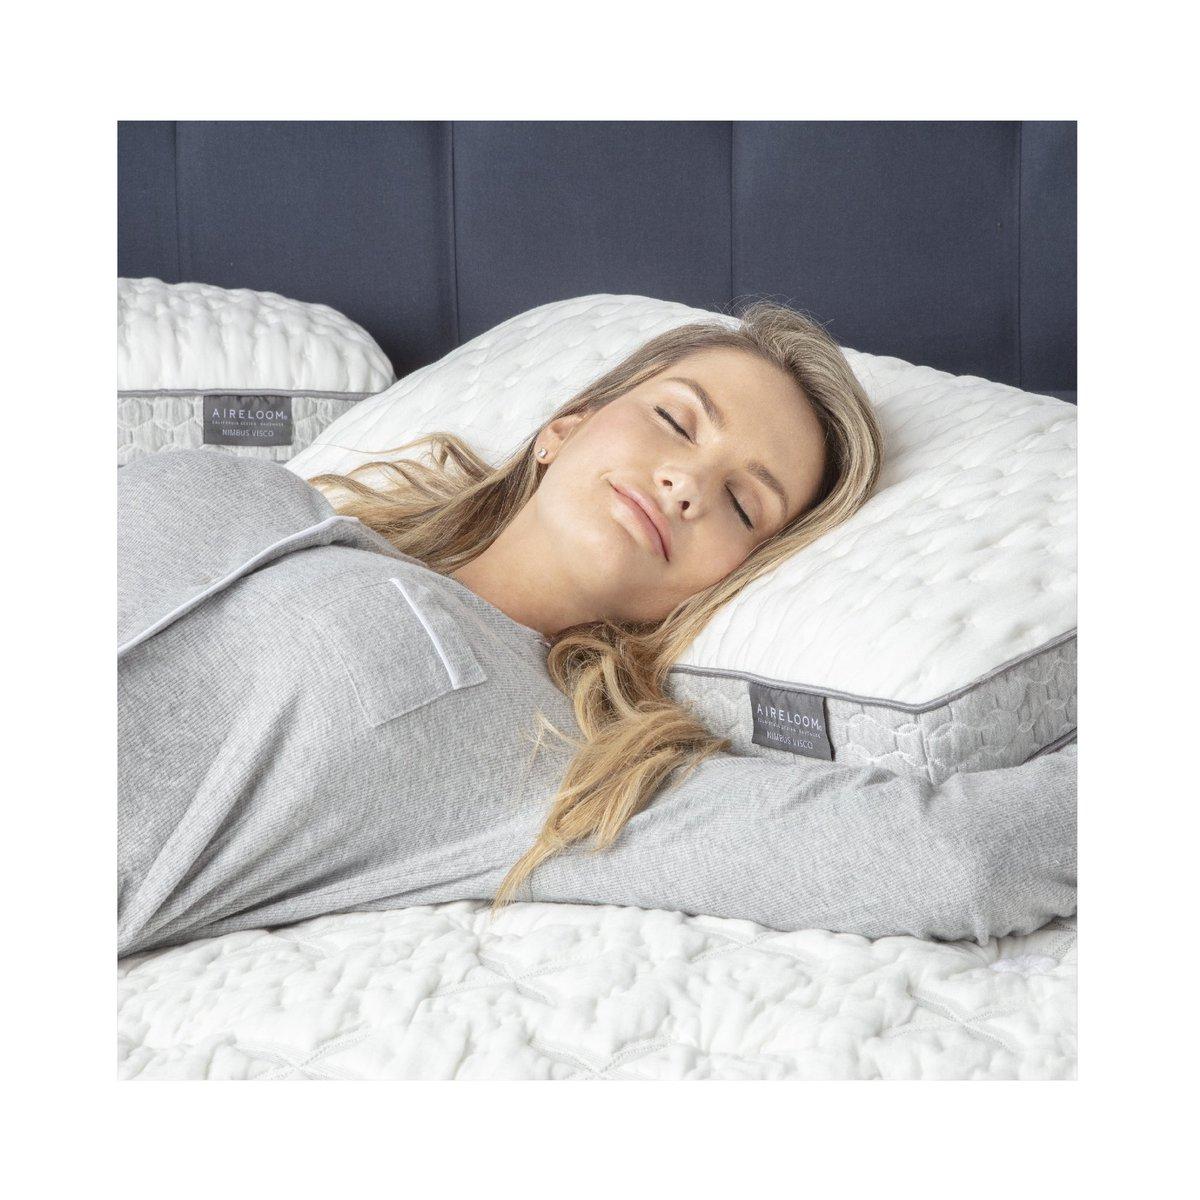 aireloom mattress aireloombeds twitter